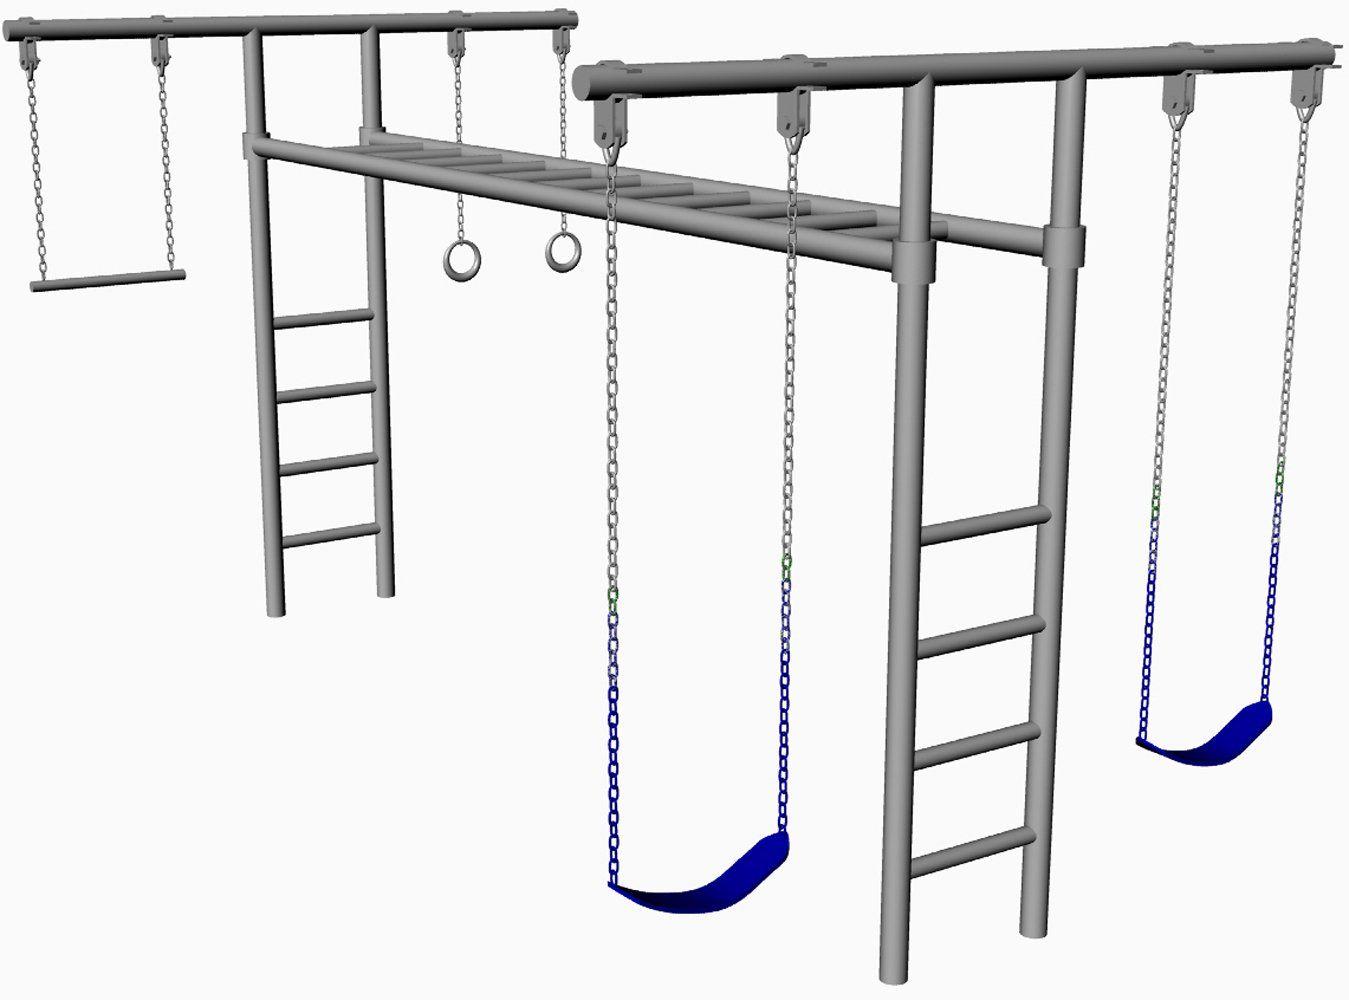 hl 50 8 foot tall heavy duty swing set adjustable monkey bars 2